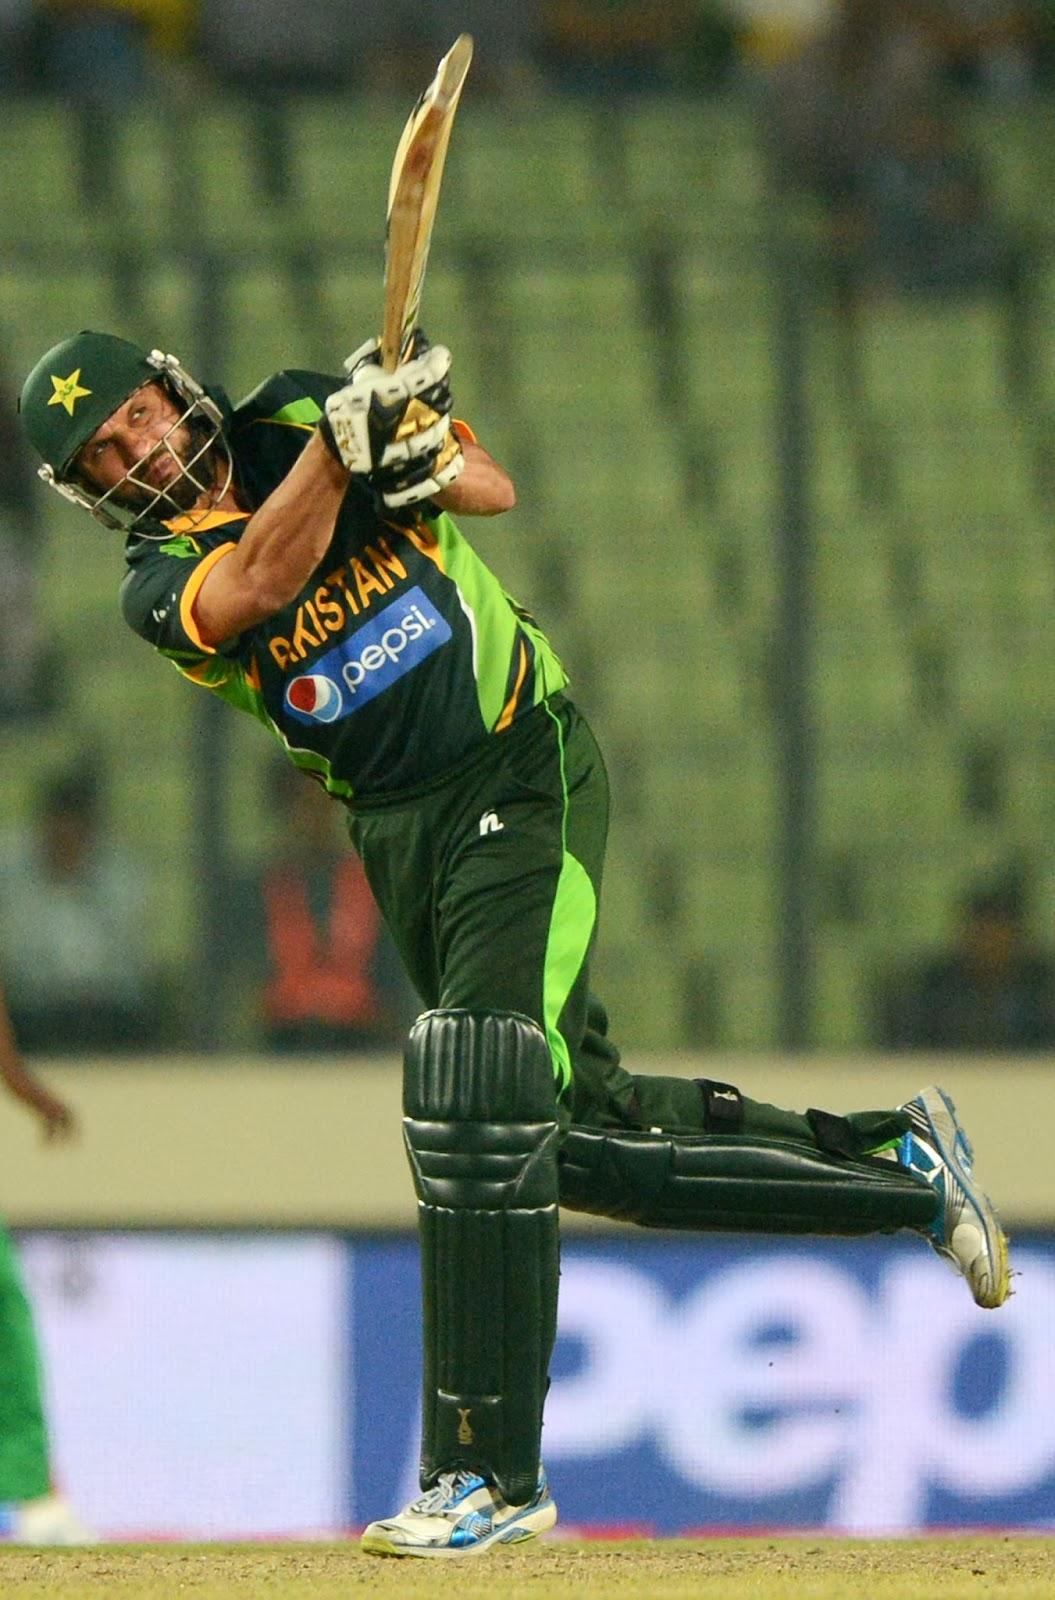 8th Match, ACC, Asia Cup, Asia Cup 2014, Bangladesh, Captain, Cricket, Misbah ul Haq, Pakistan, Pakistan vs Bangladesh, Shahid Afridi, Shakib Al Hasan, Sports,